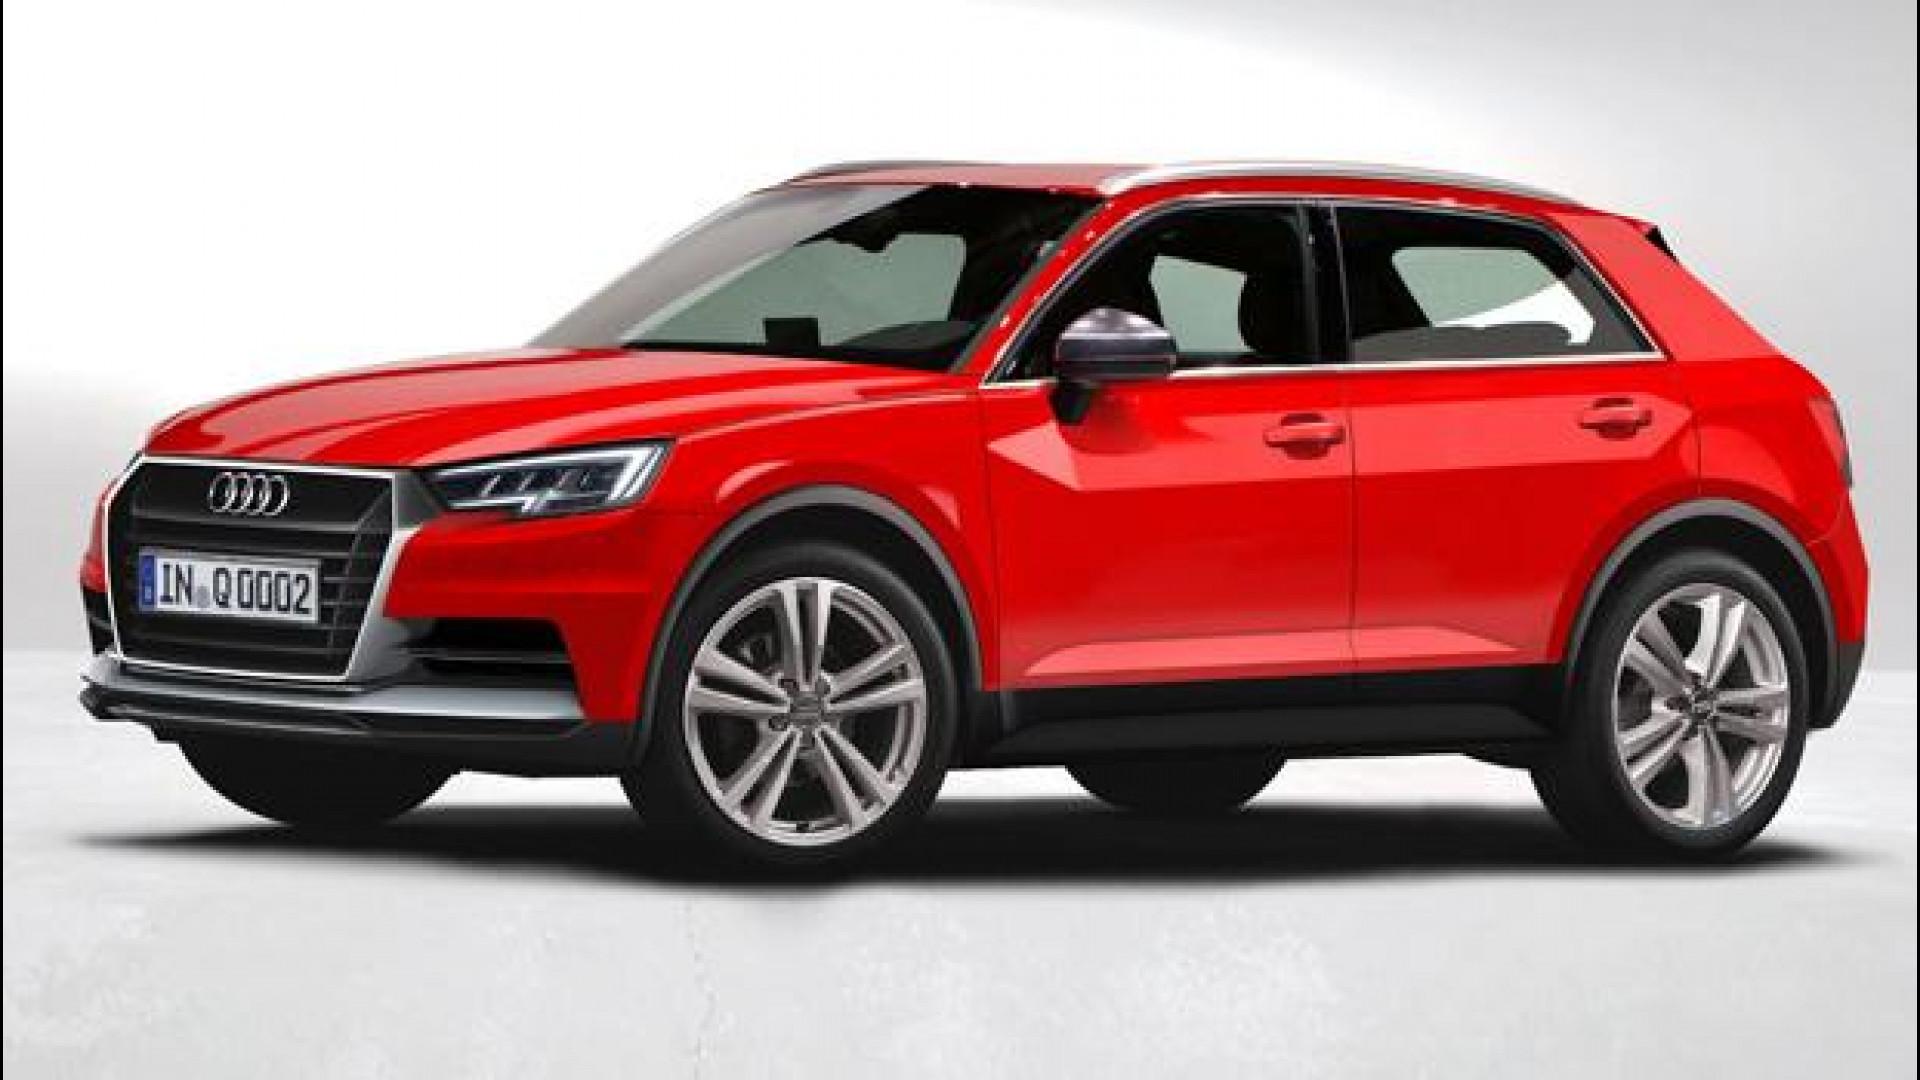 Audi Q Come Sarà La Piccola SUV Motorcom Italia - Audi q1